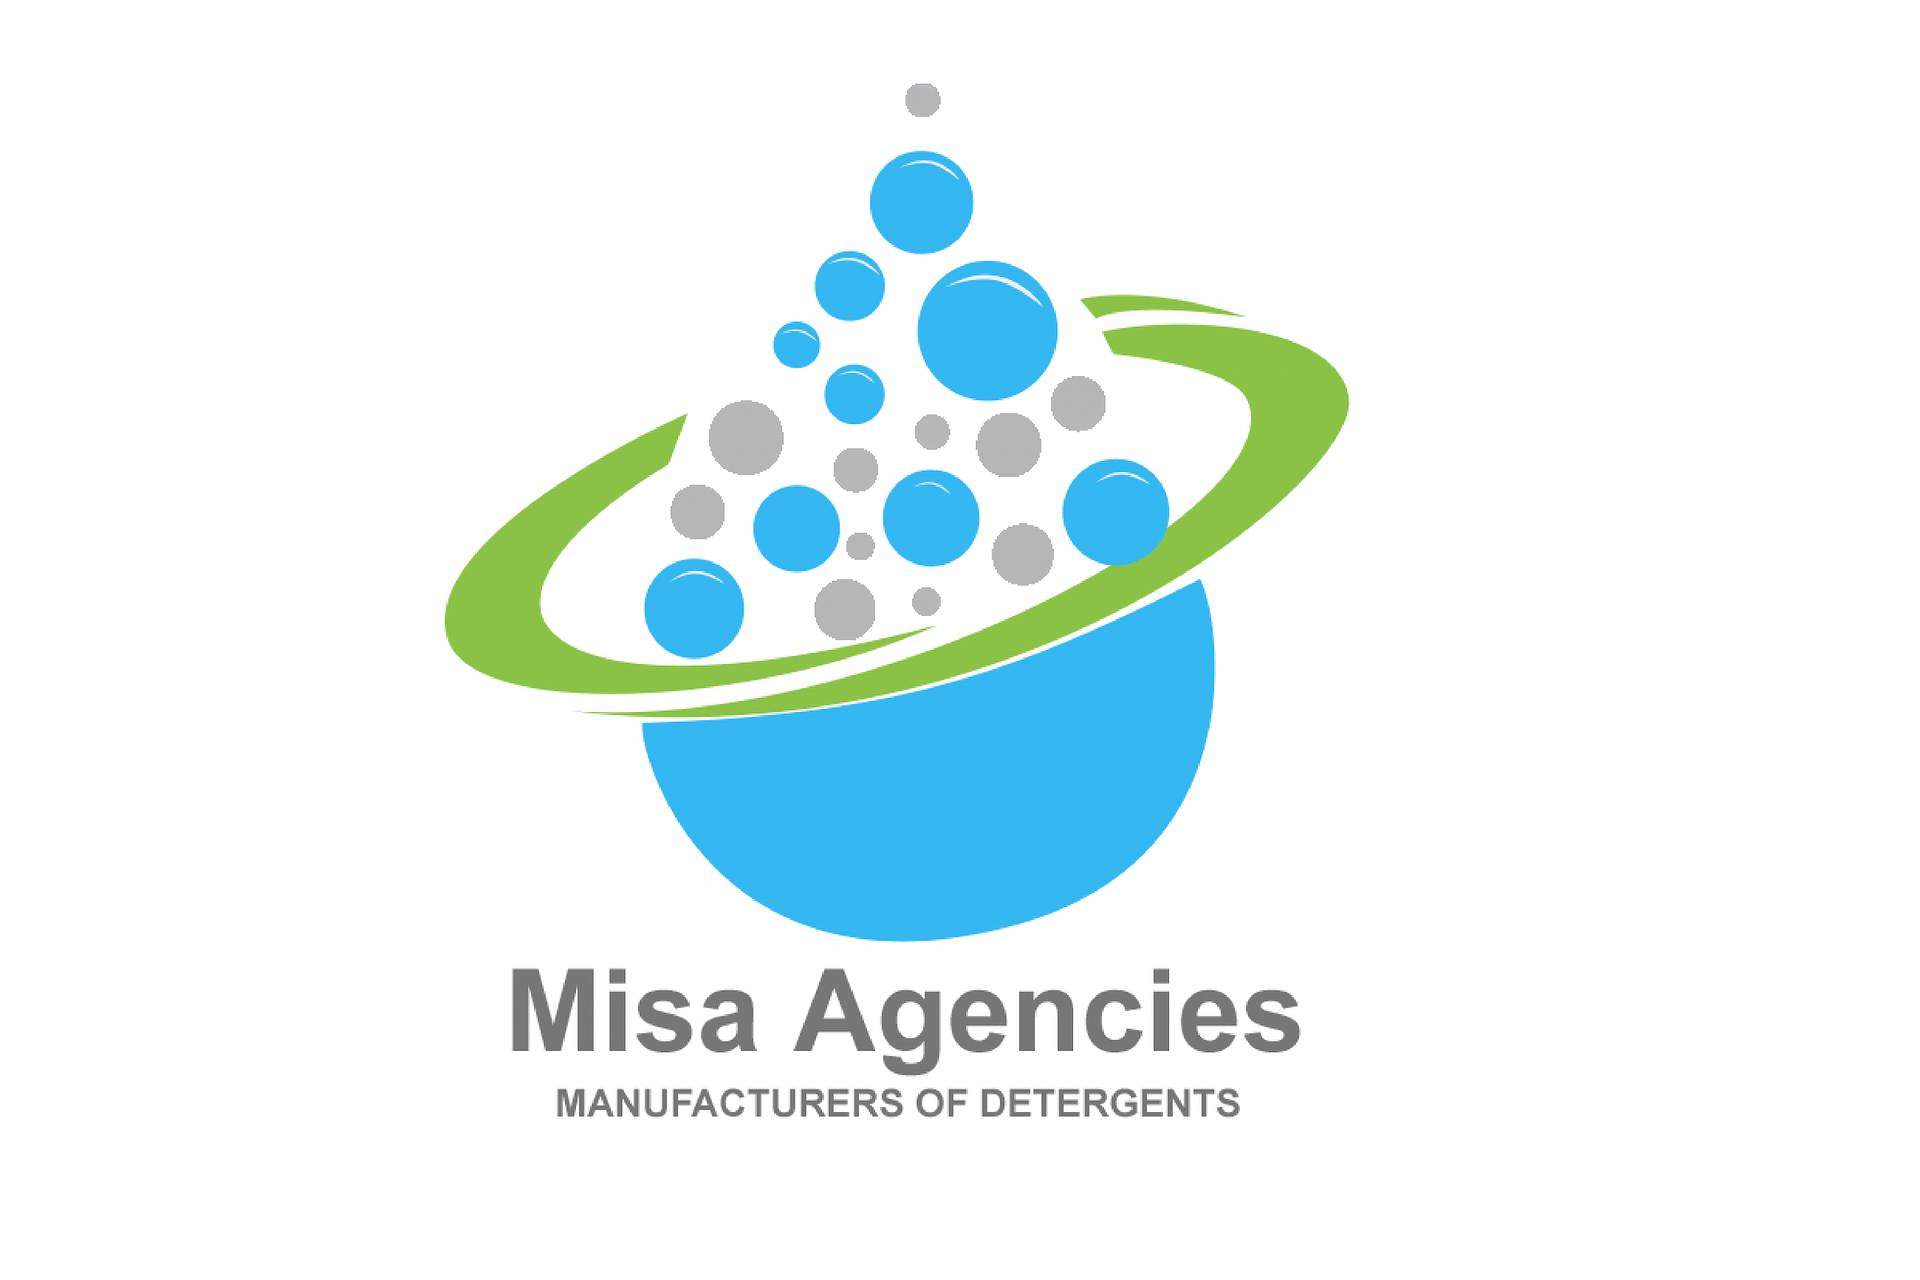 Misa Agencies